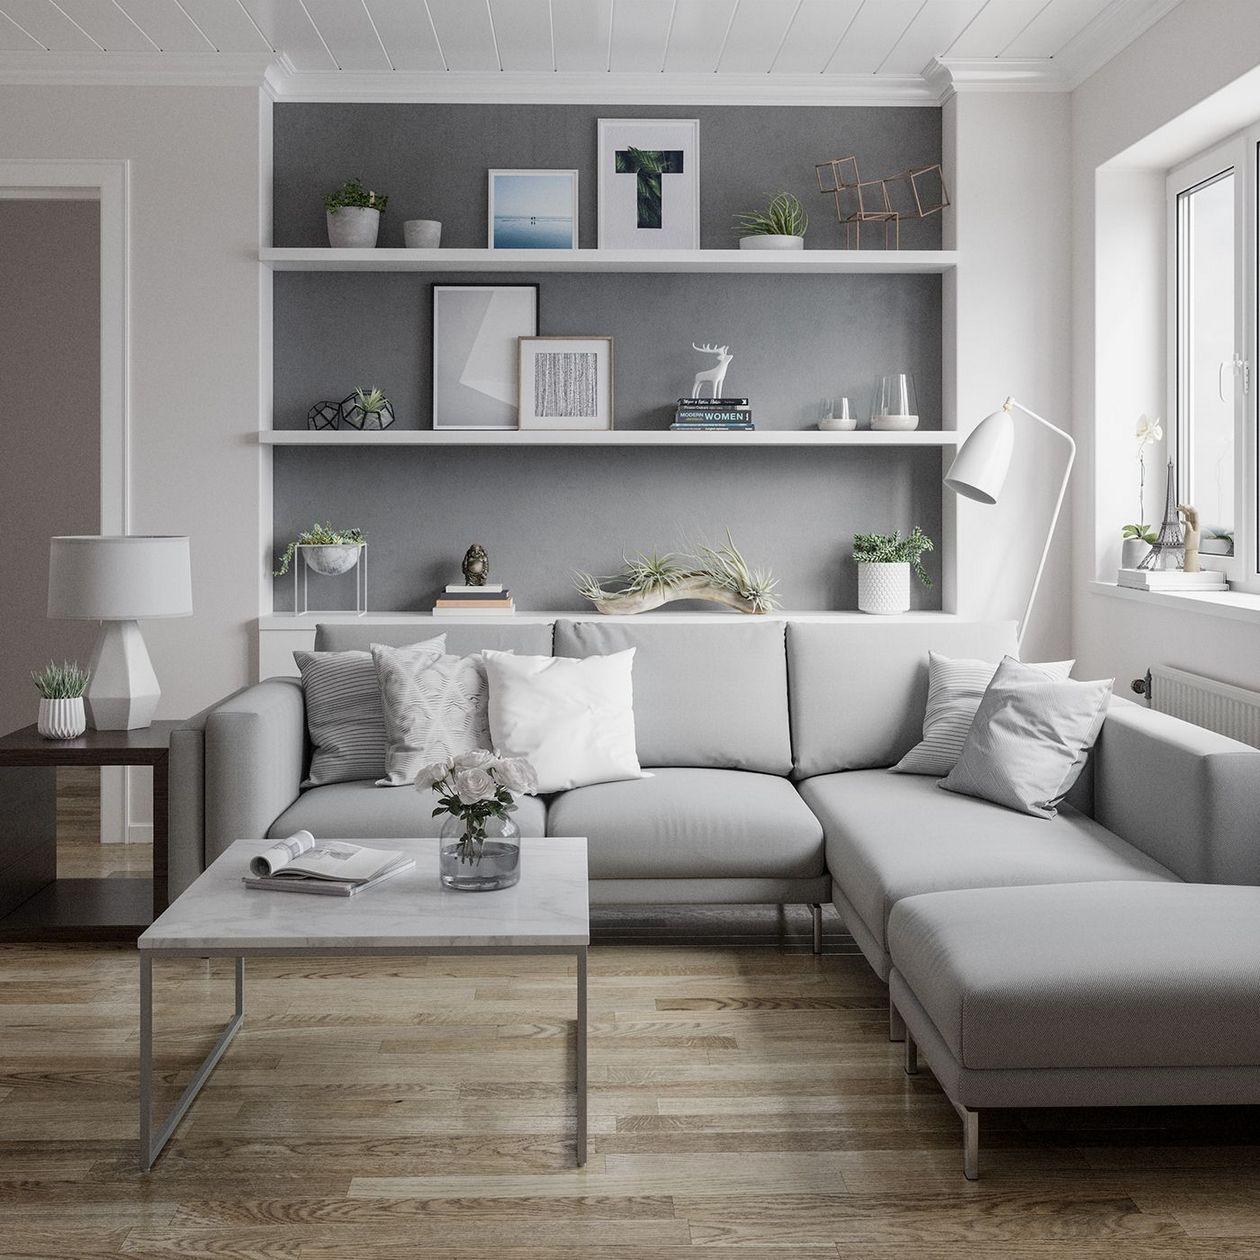 Amazing Living Room Decor Ideas27